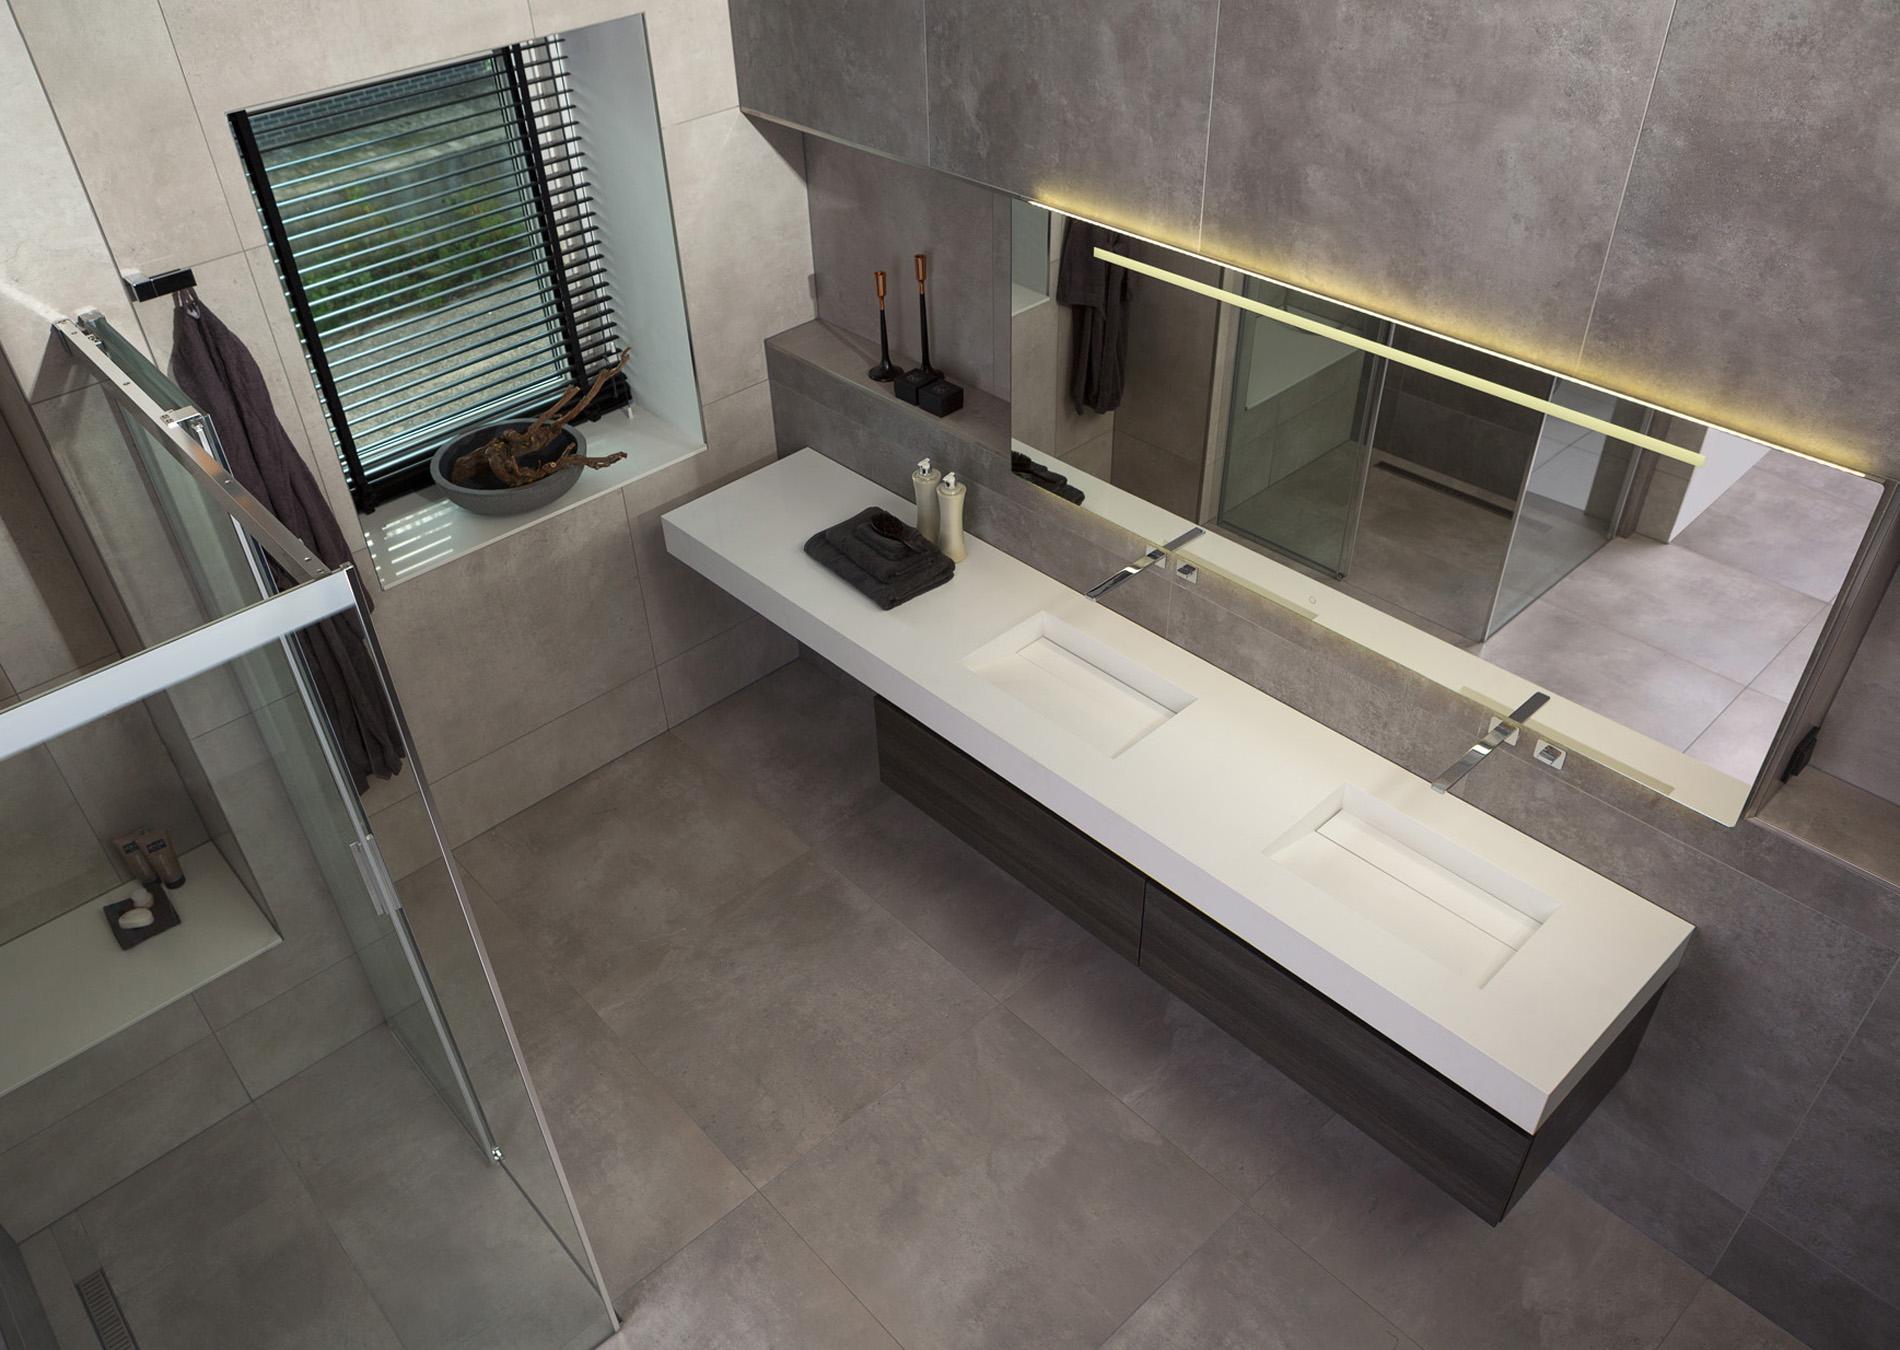 Beautiful Laufen Badkamer Contemporary - House Design Ideas 2018 ...